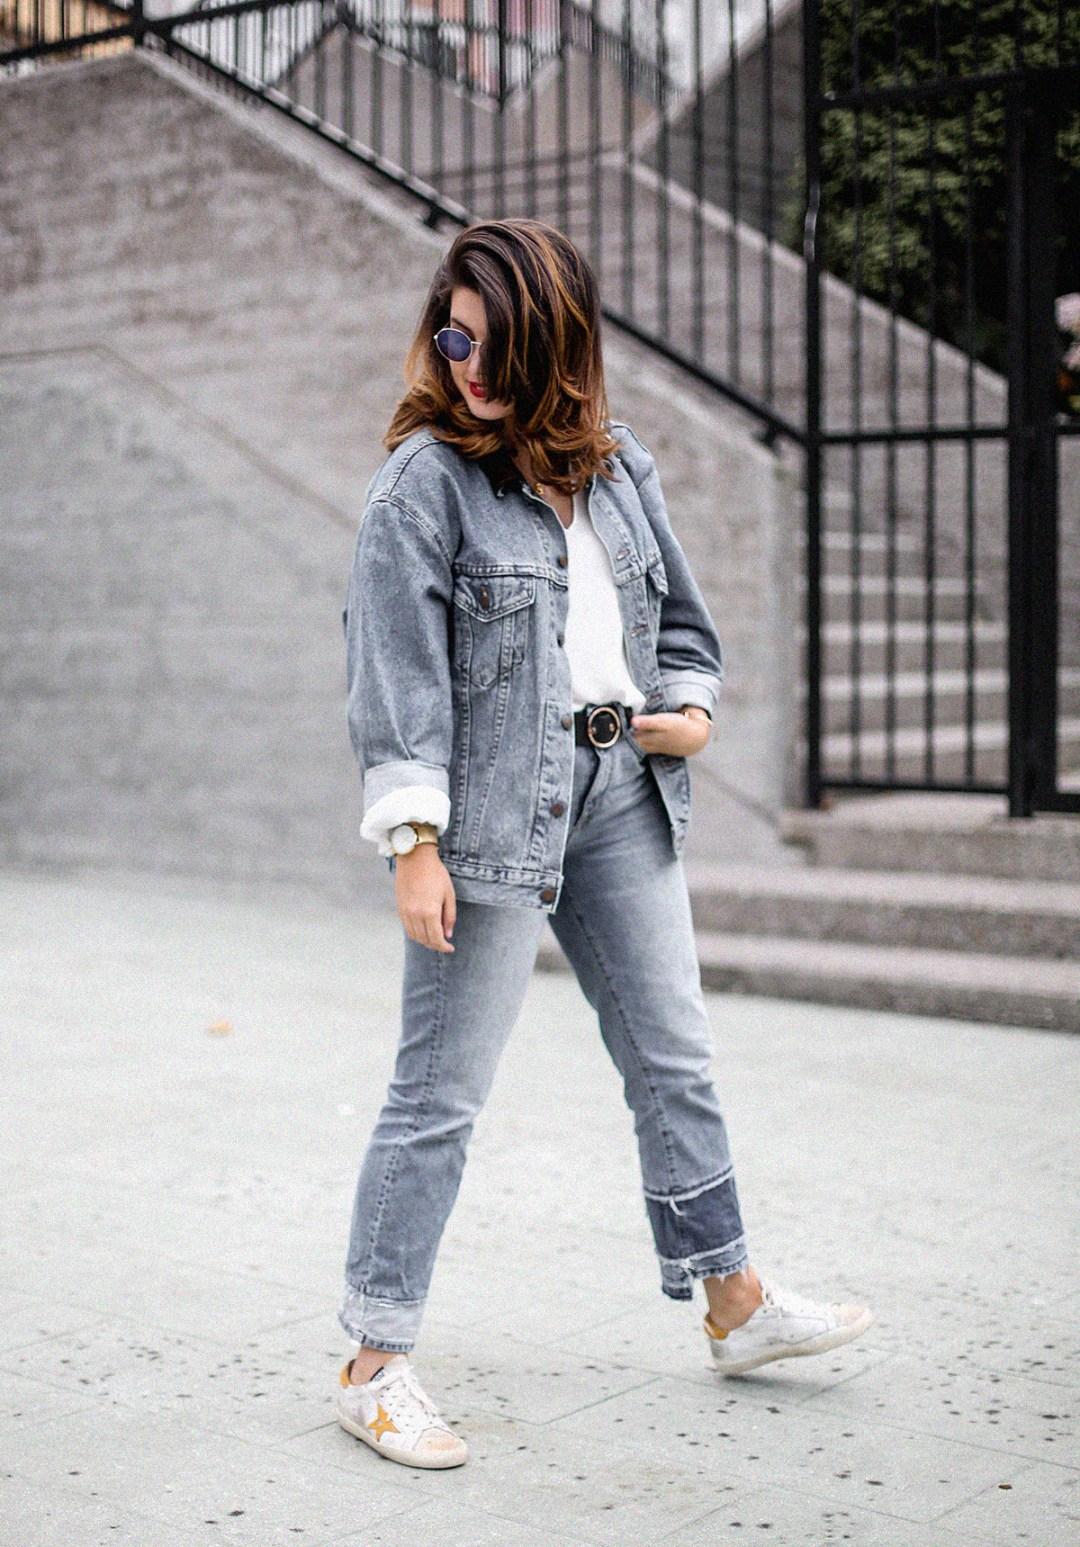 double-denim-look-vintage-jacket-levis-golden-goose-sneakers-outfit13